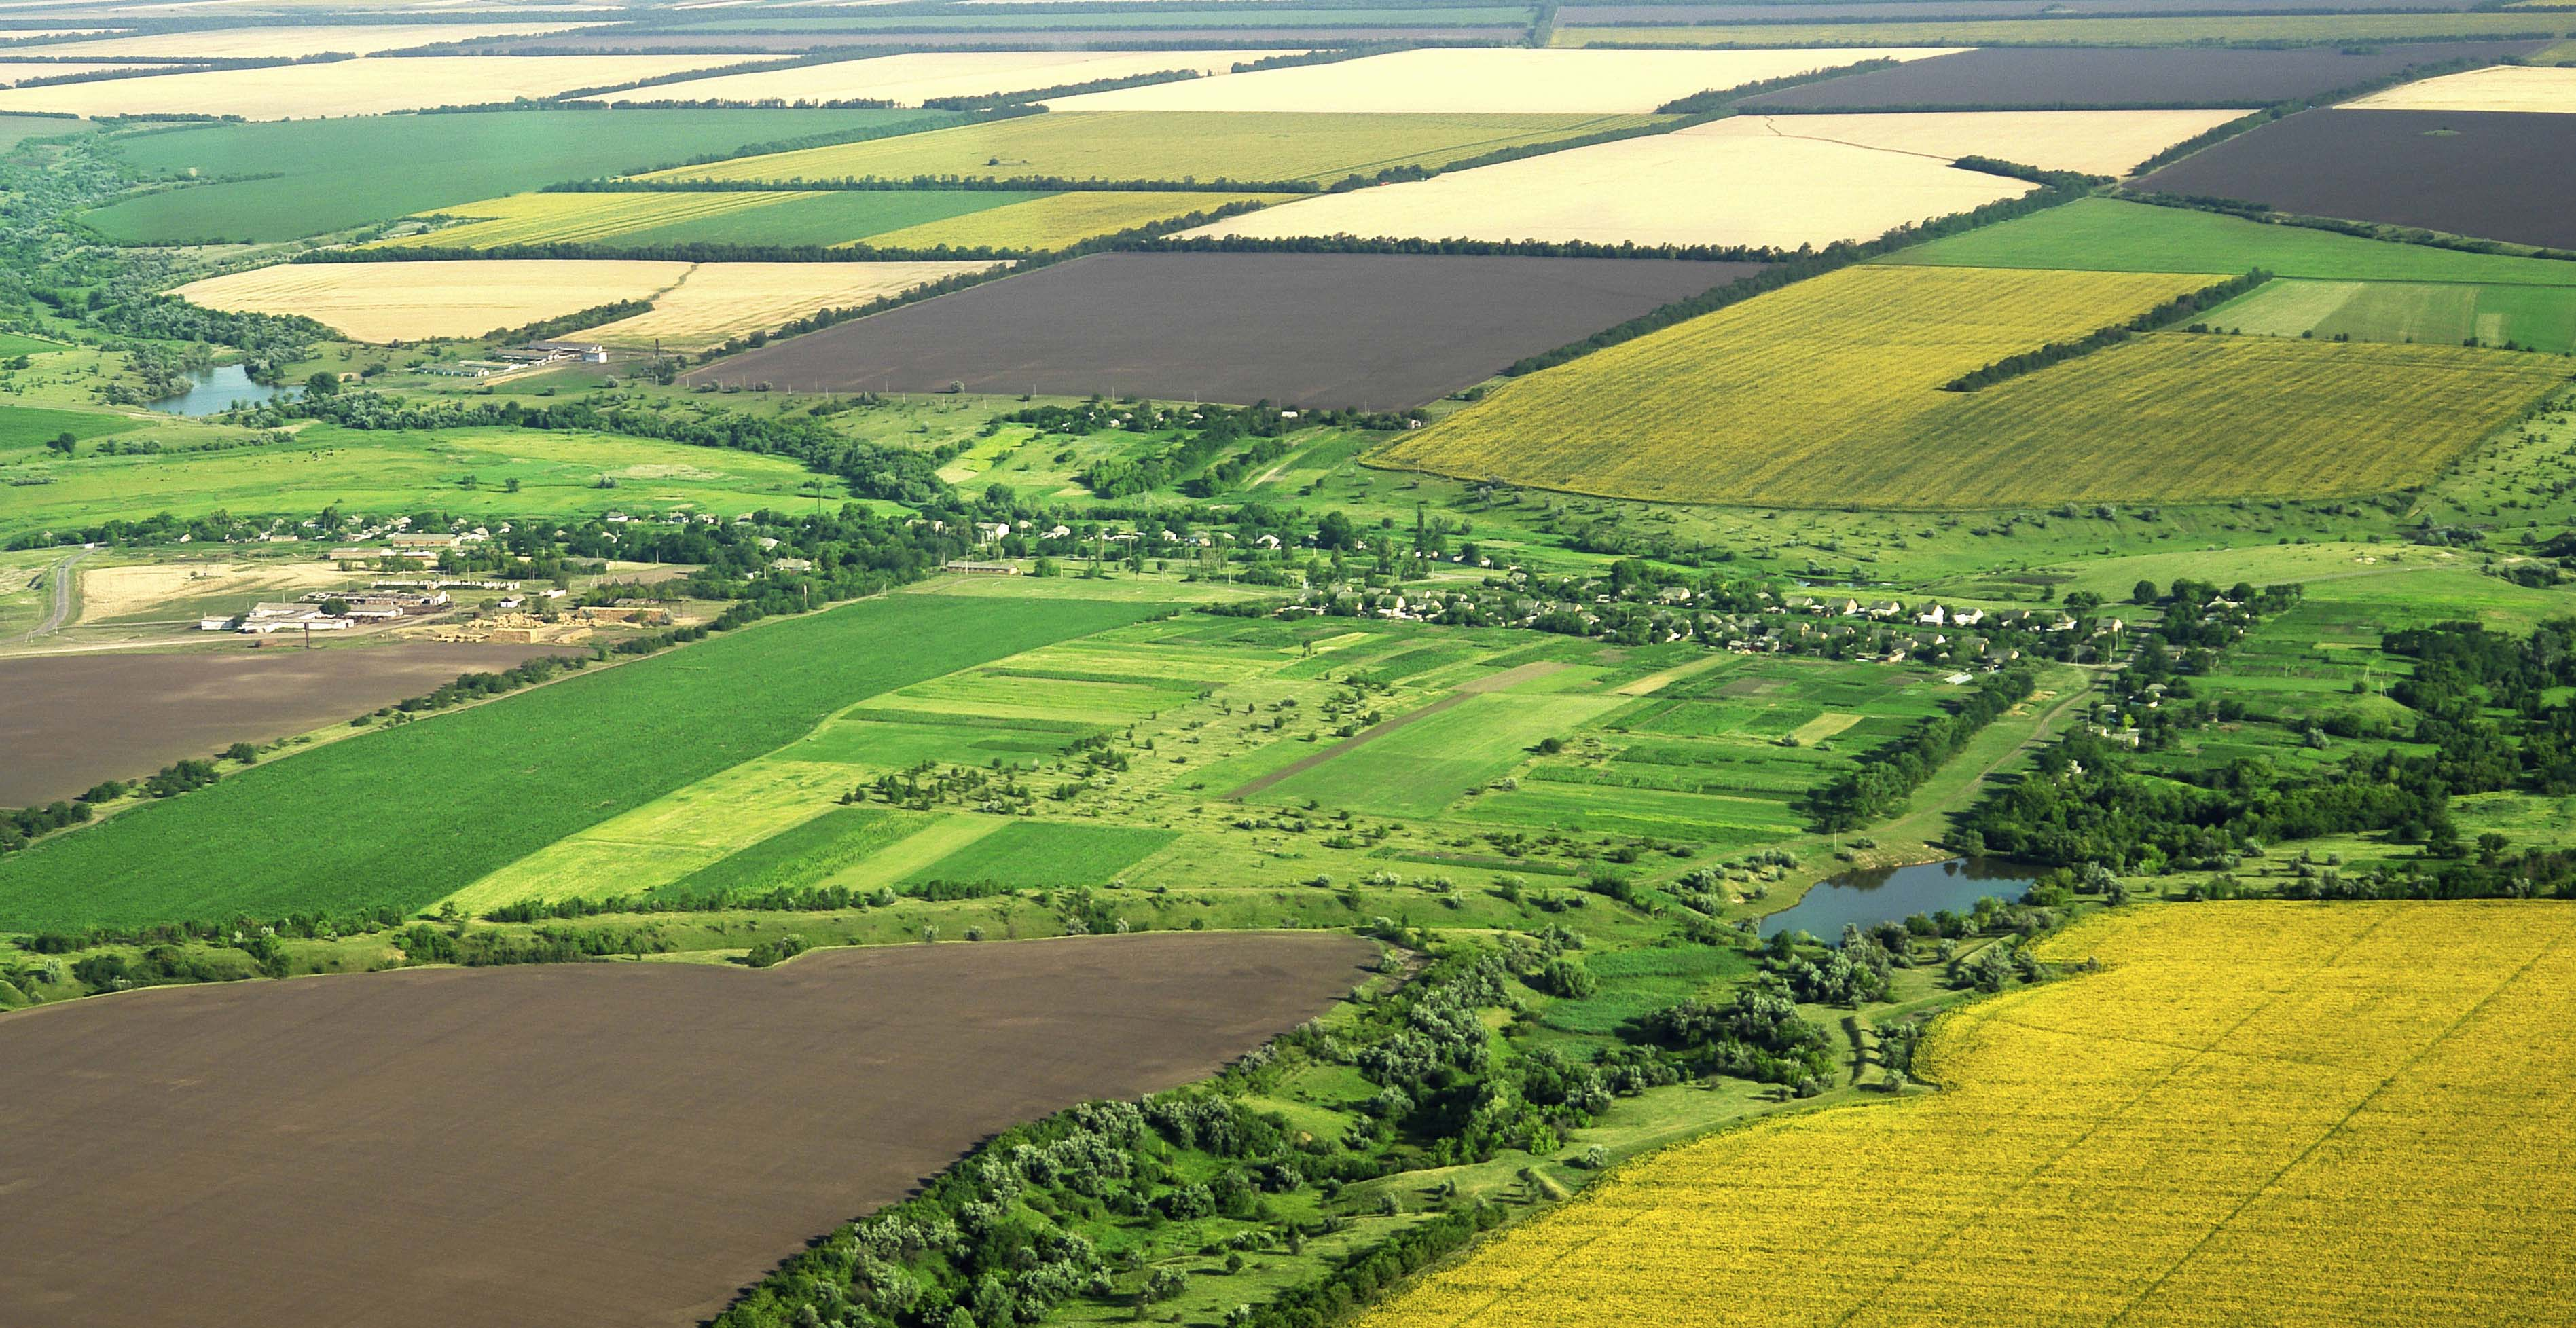 terenuri_agricole